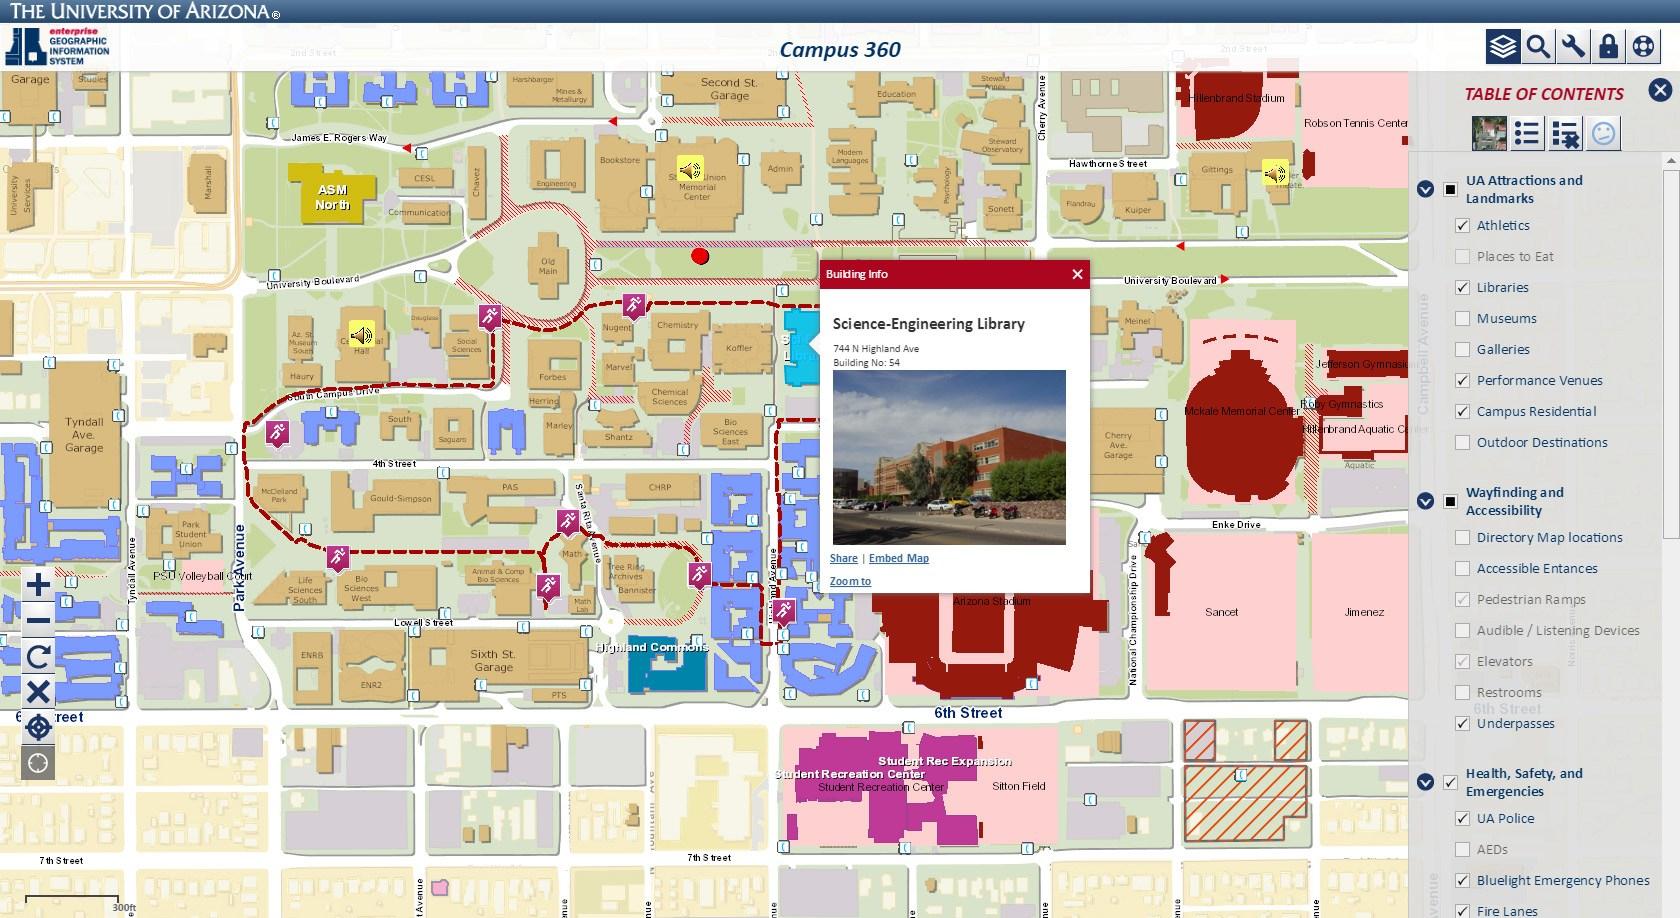 Florida State University Campus Map - Florida State University Map